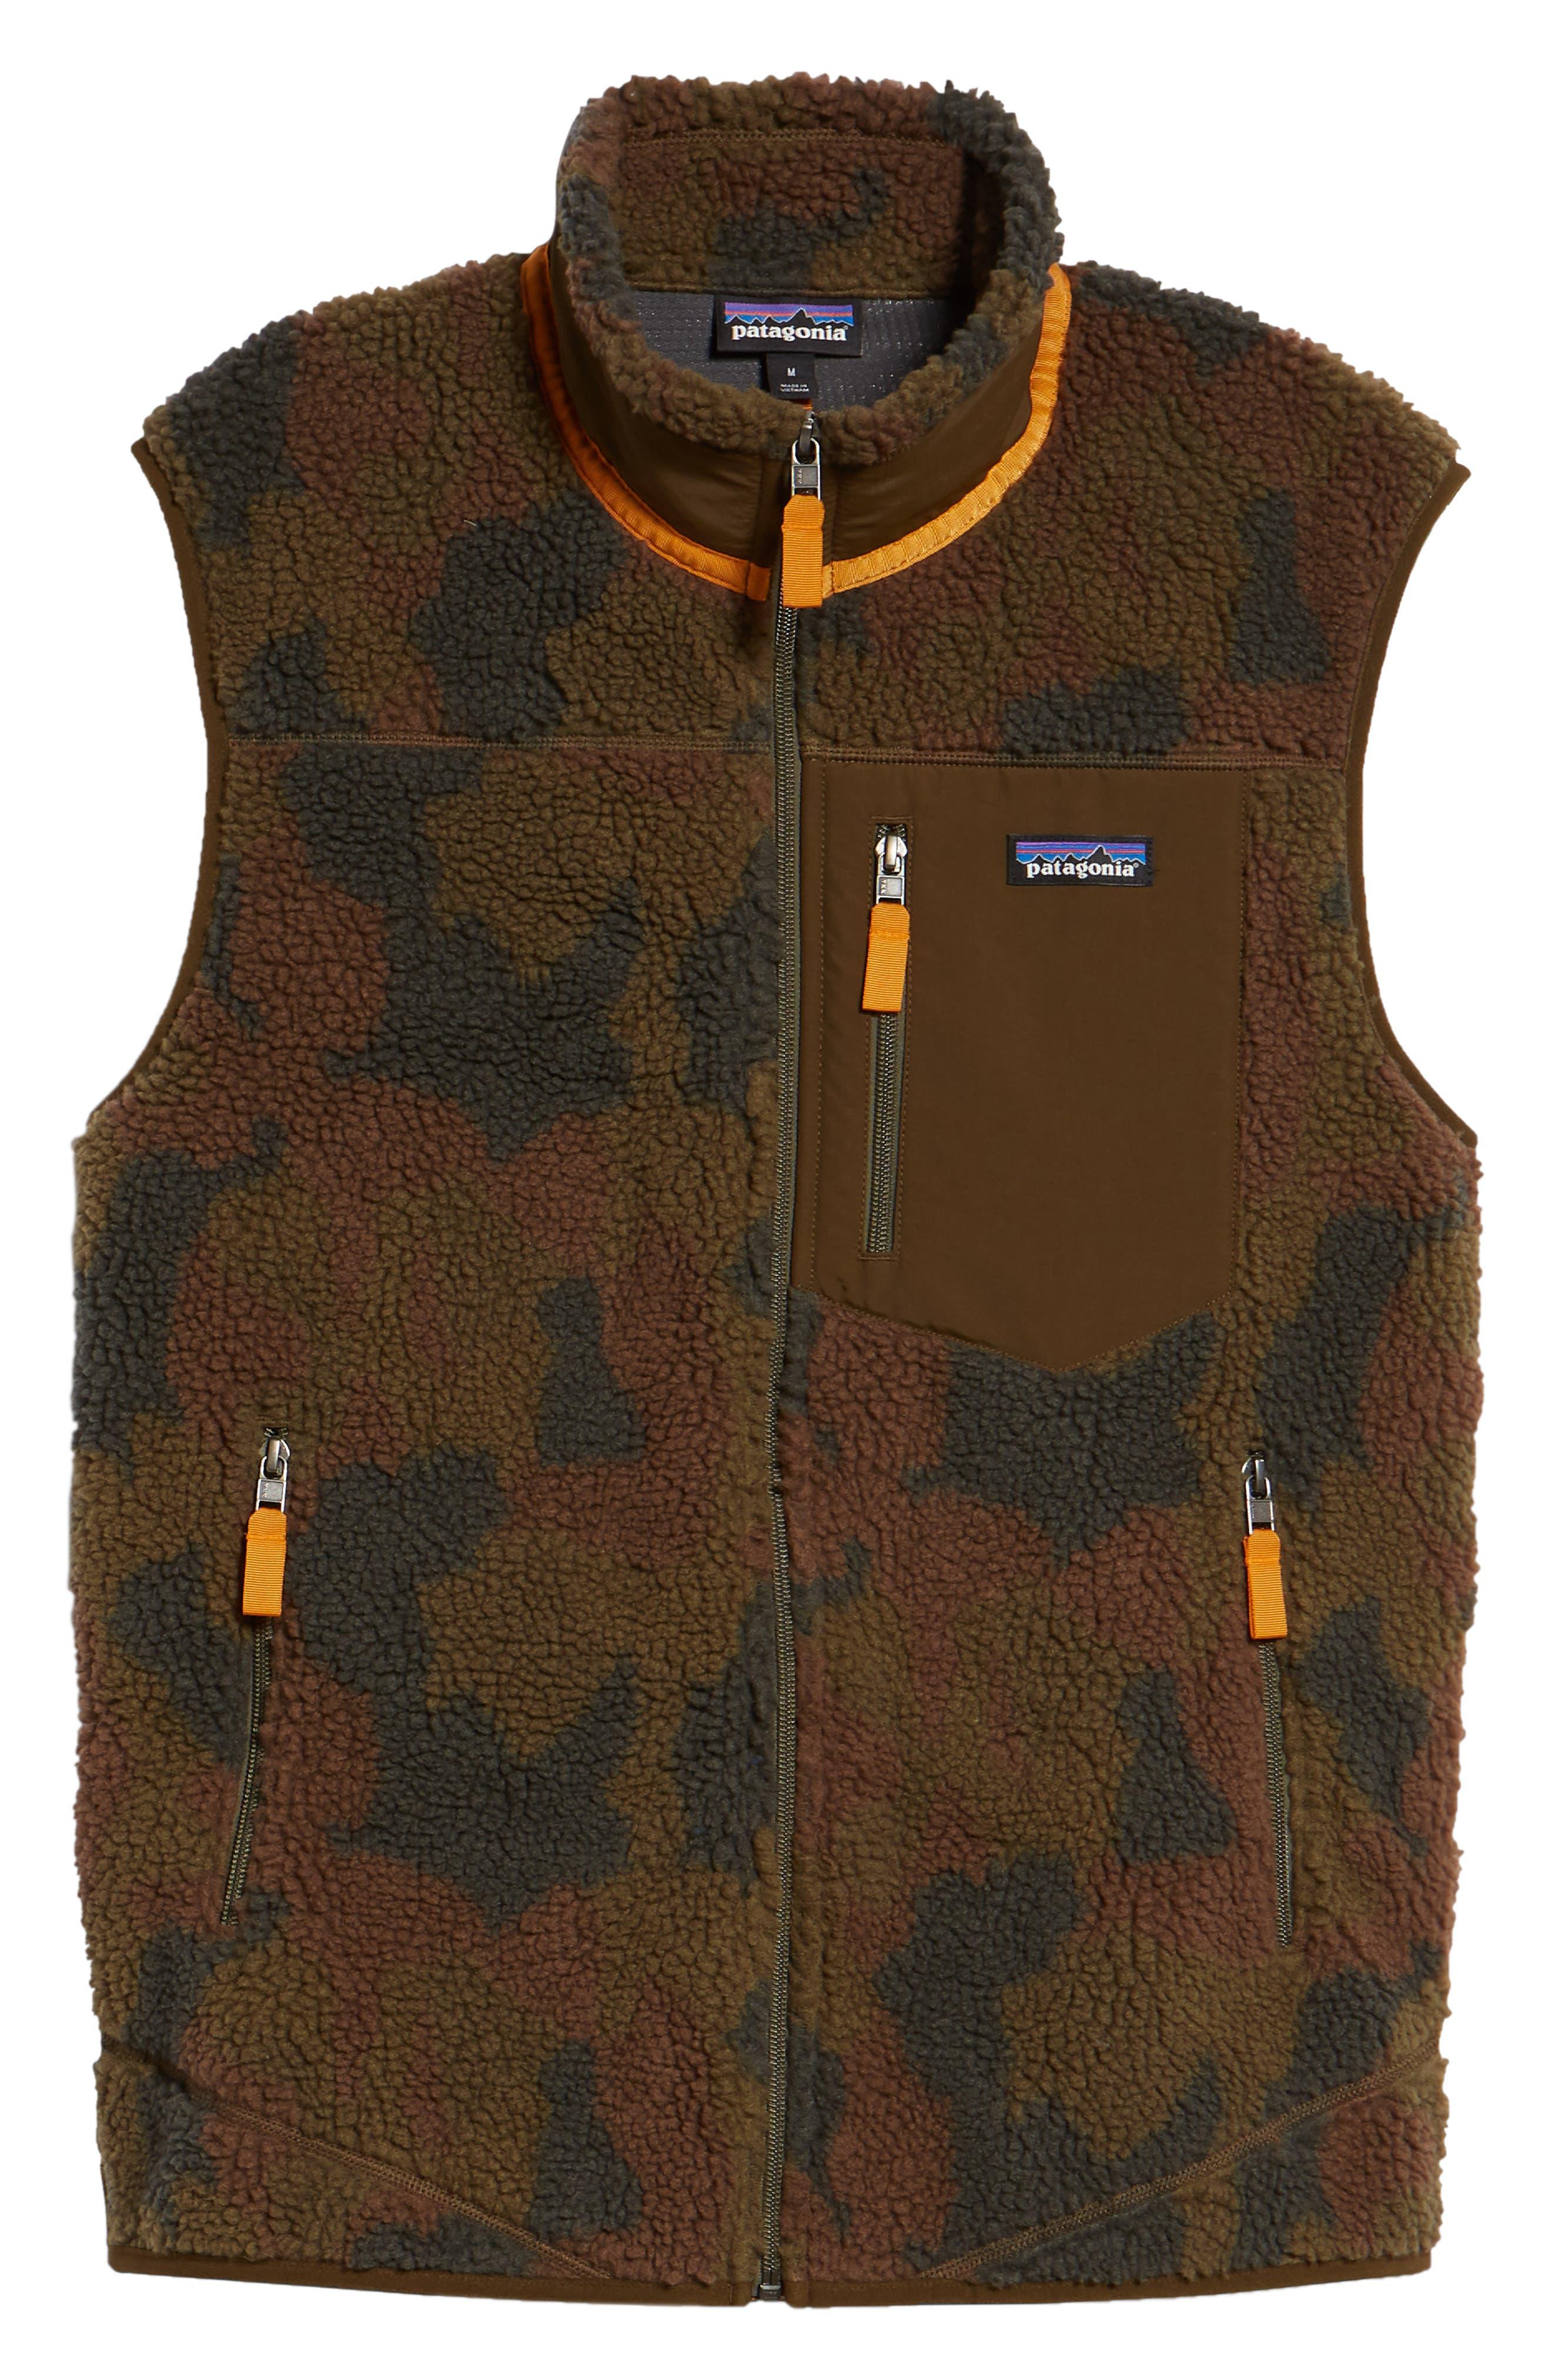 Classic Retro-X<sup>®</sup> Windproof Vest,                             Alternate thumbnail 6, color,                             BUNKER CAMO CARGO GREEN